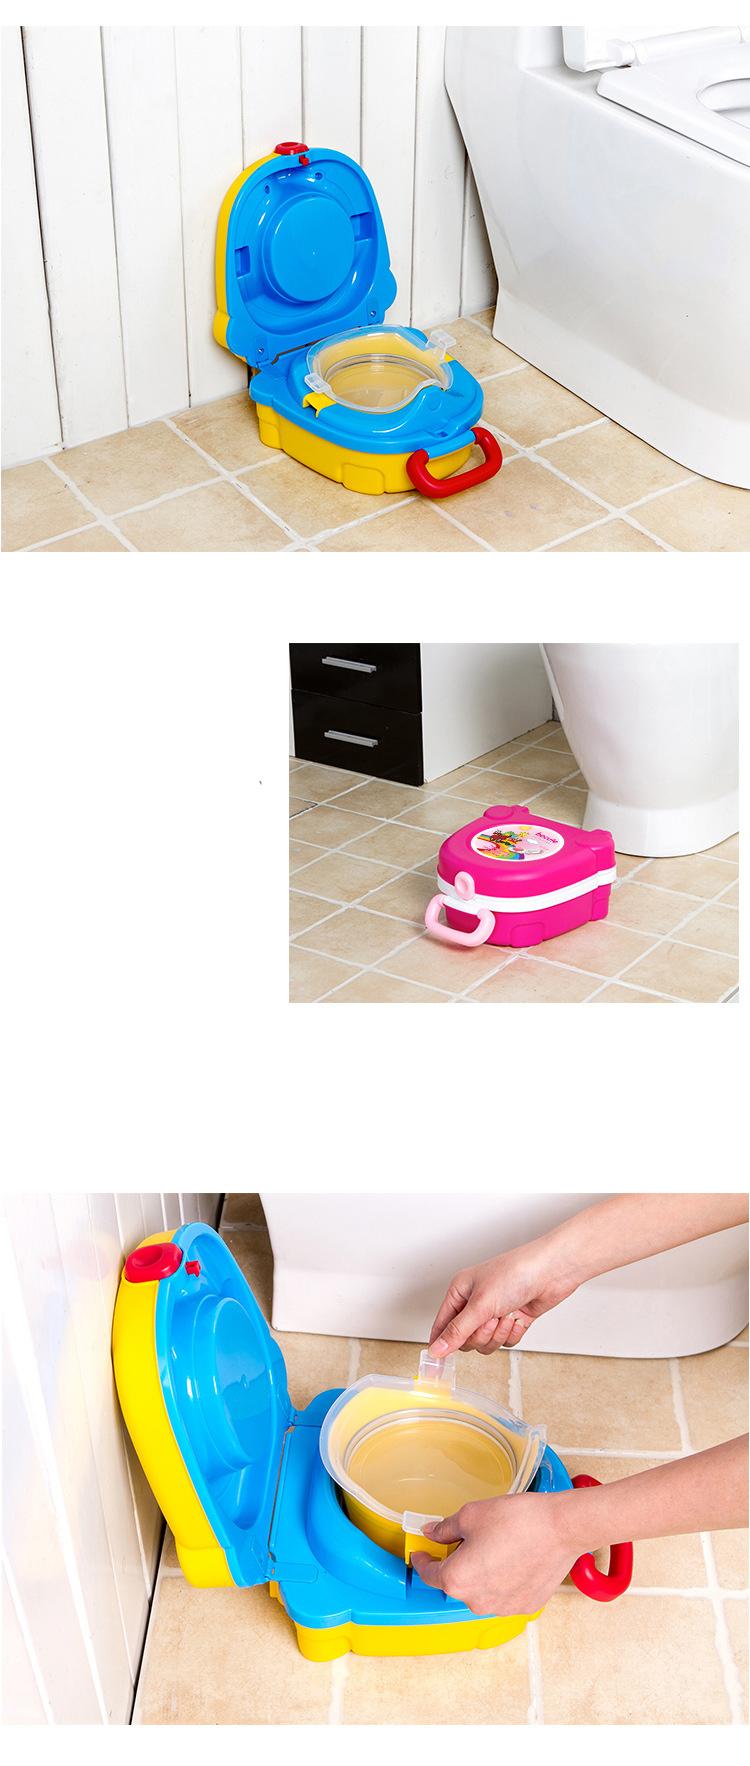 portativnyj dorozhnyj gorshok my carry potty 05 - Портативный дорожный горшок My Carry Potty Becute